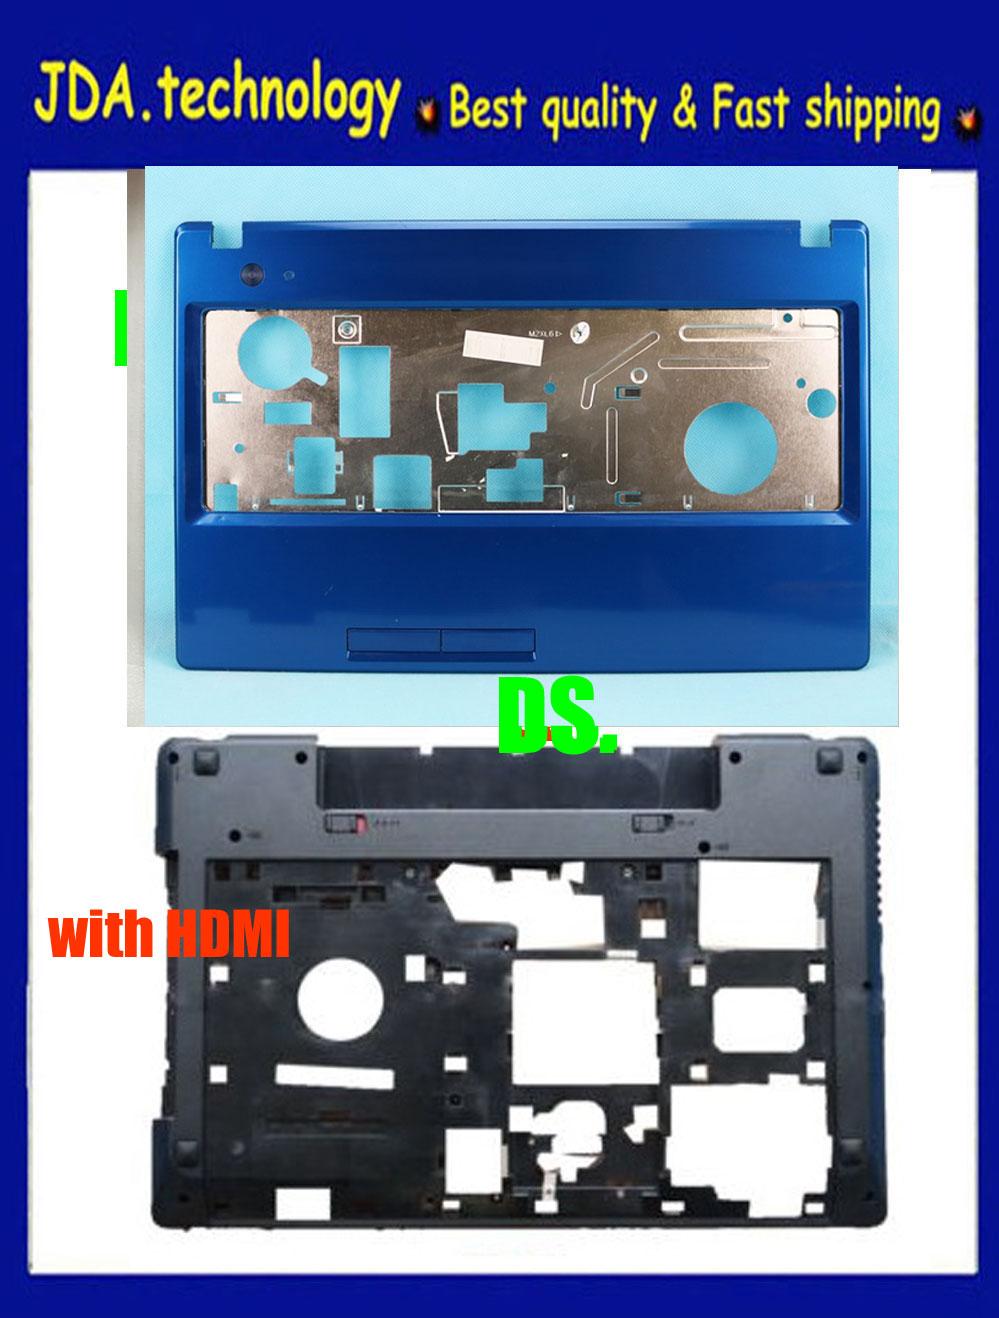 Nuevo/orig carcasa superior para Lenovo G580 G585 cubierta superior con reposamanos + funda de base inferior D cubierta HDMI